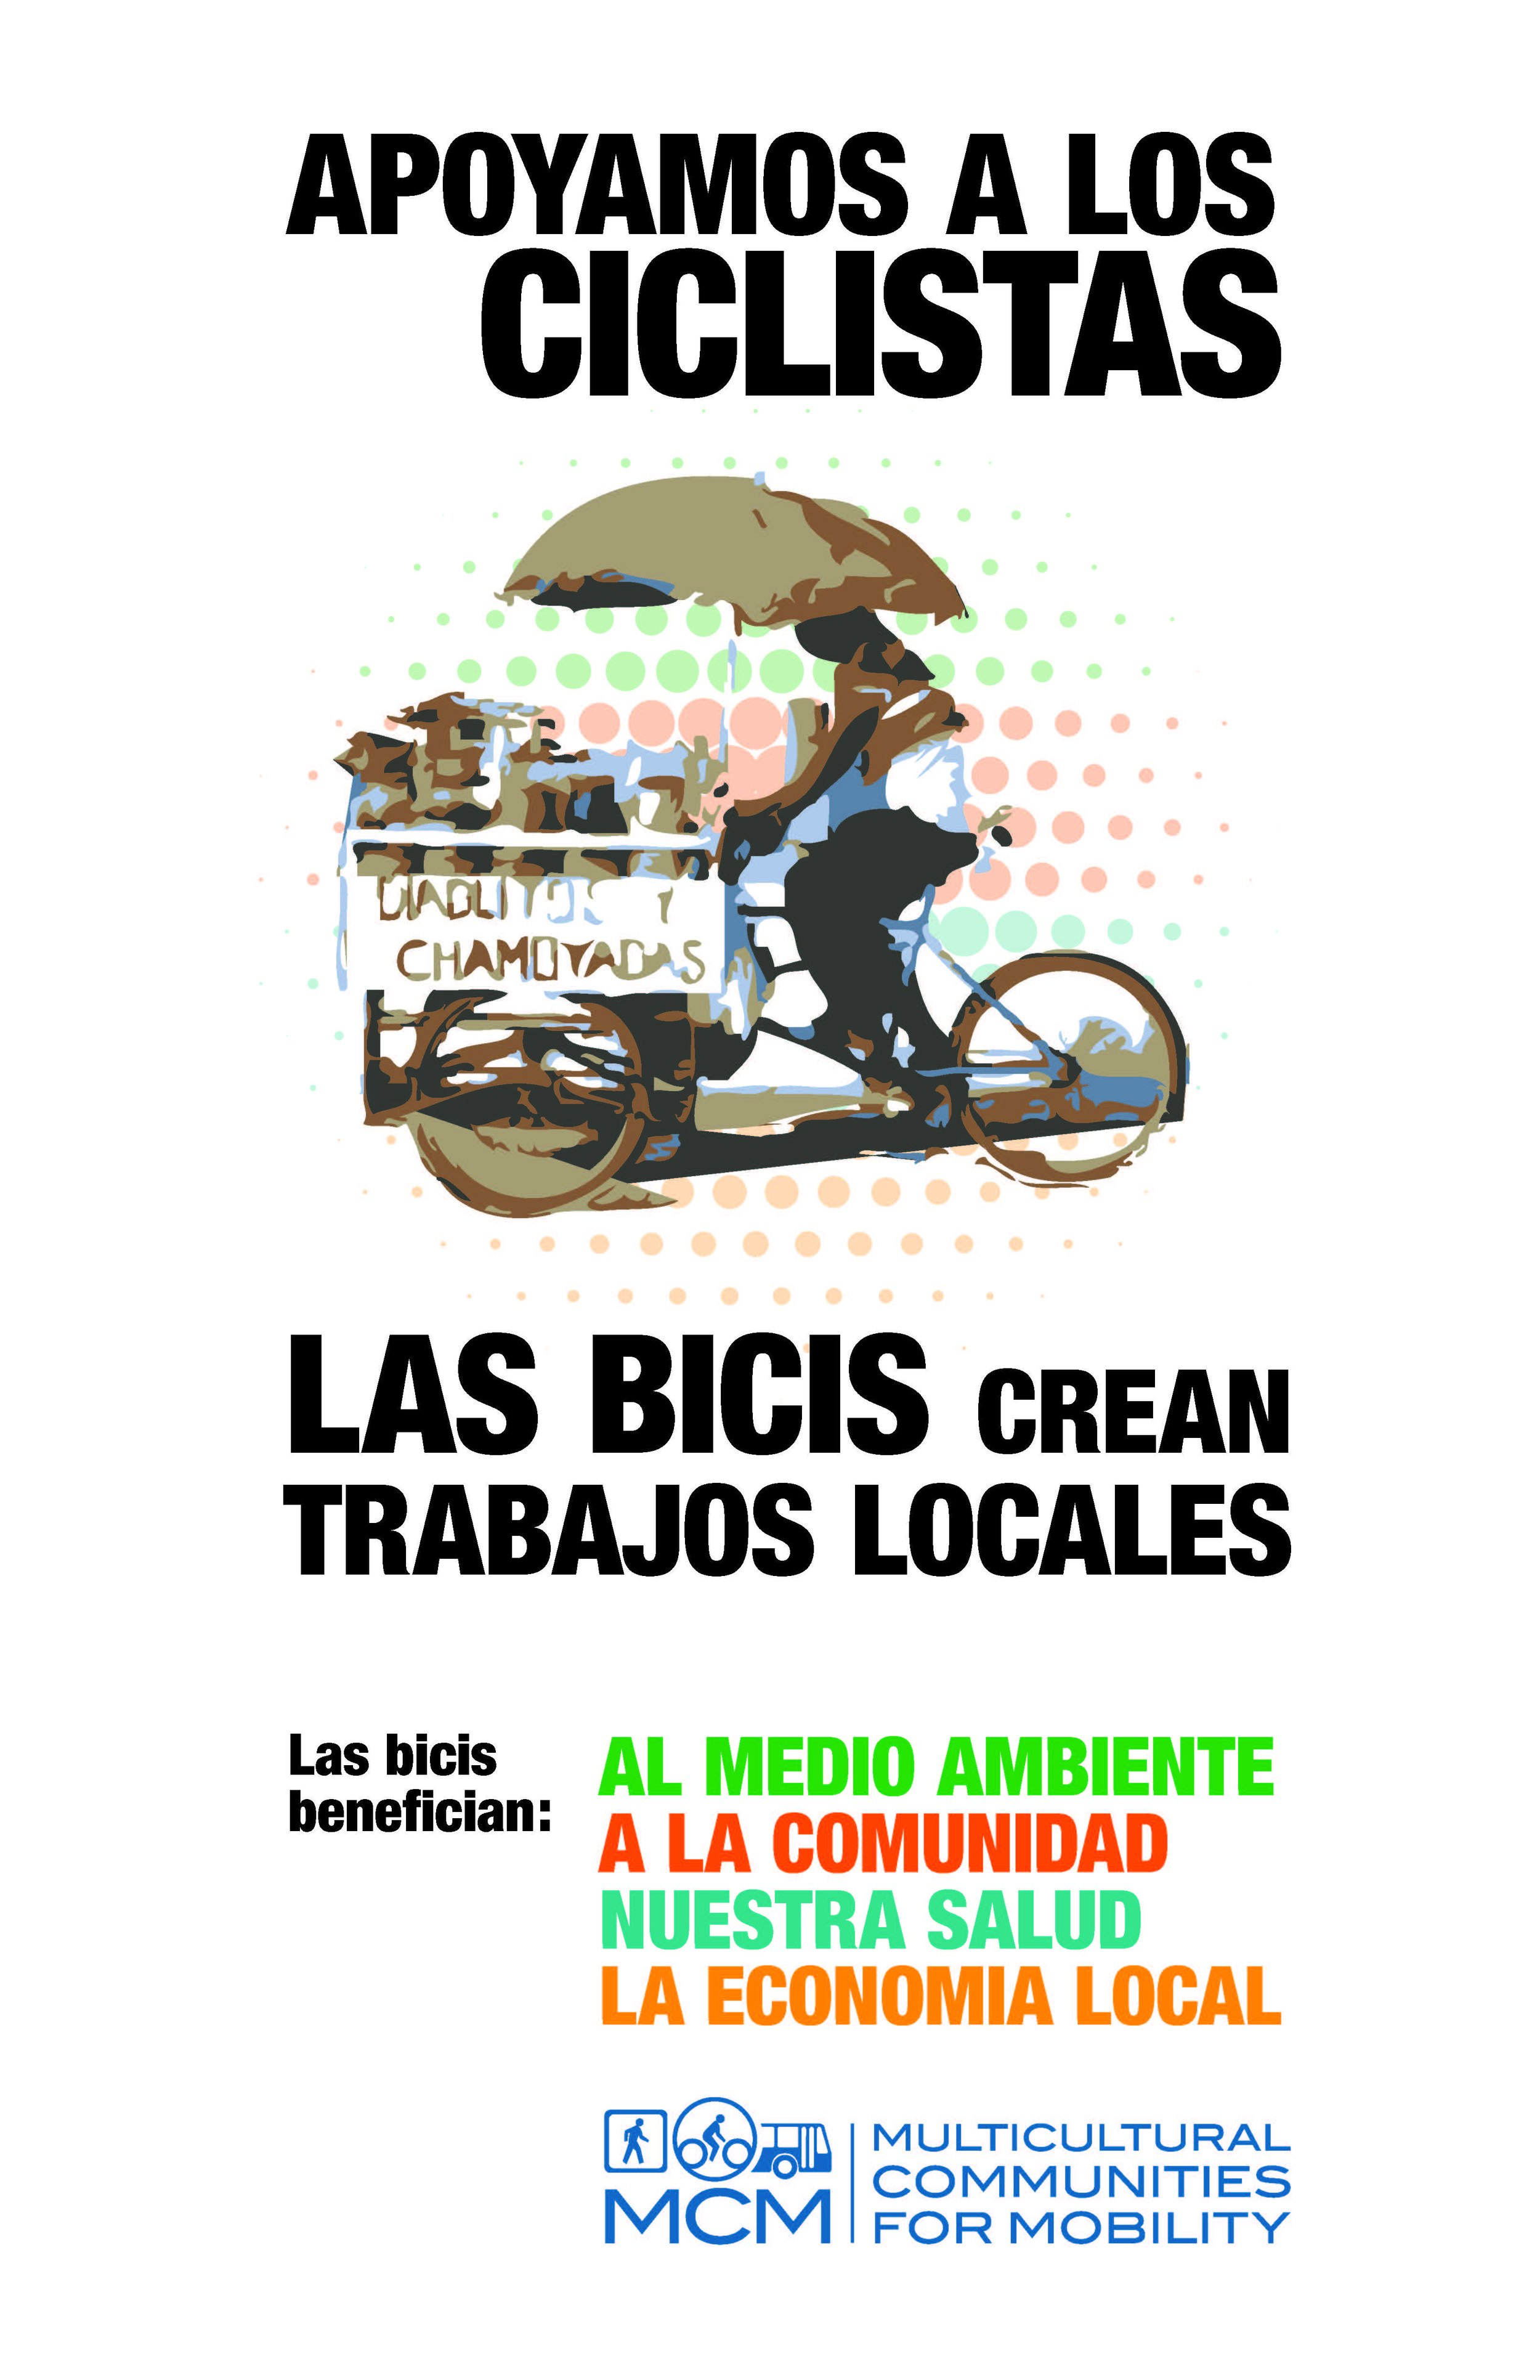 MCM BH promotores poster 2.jpg